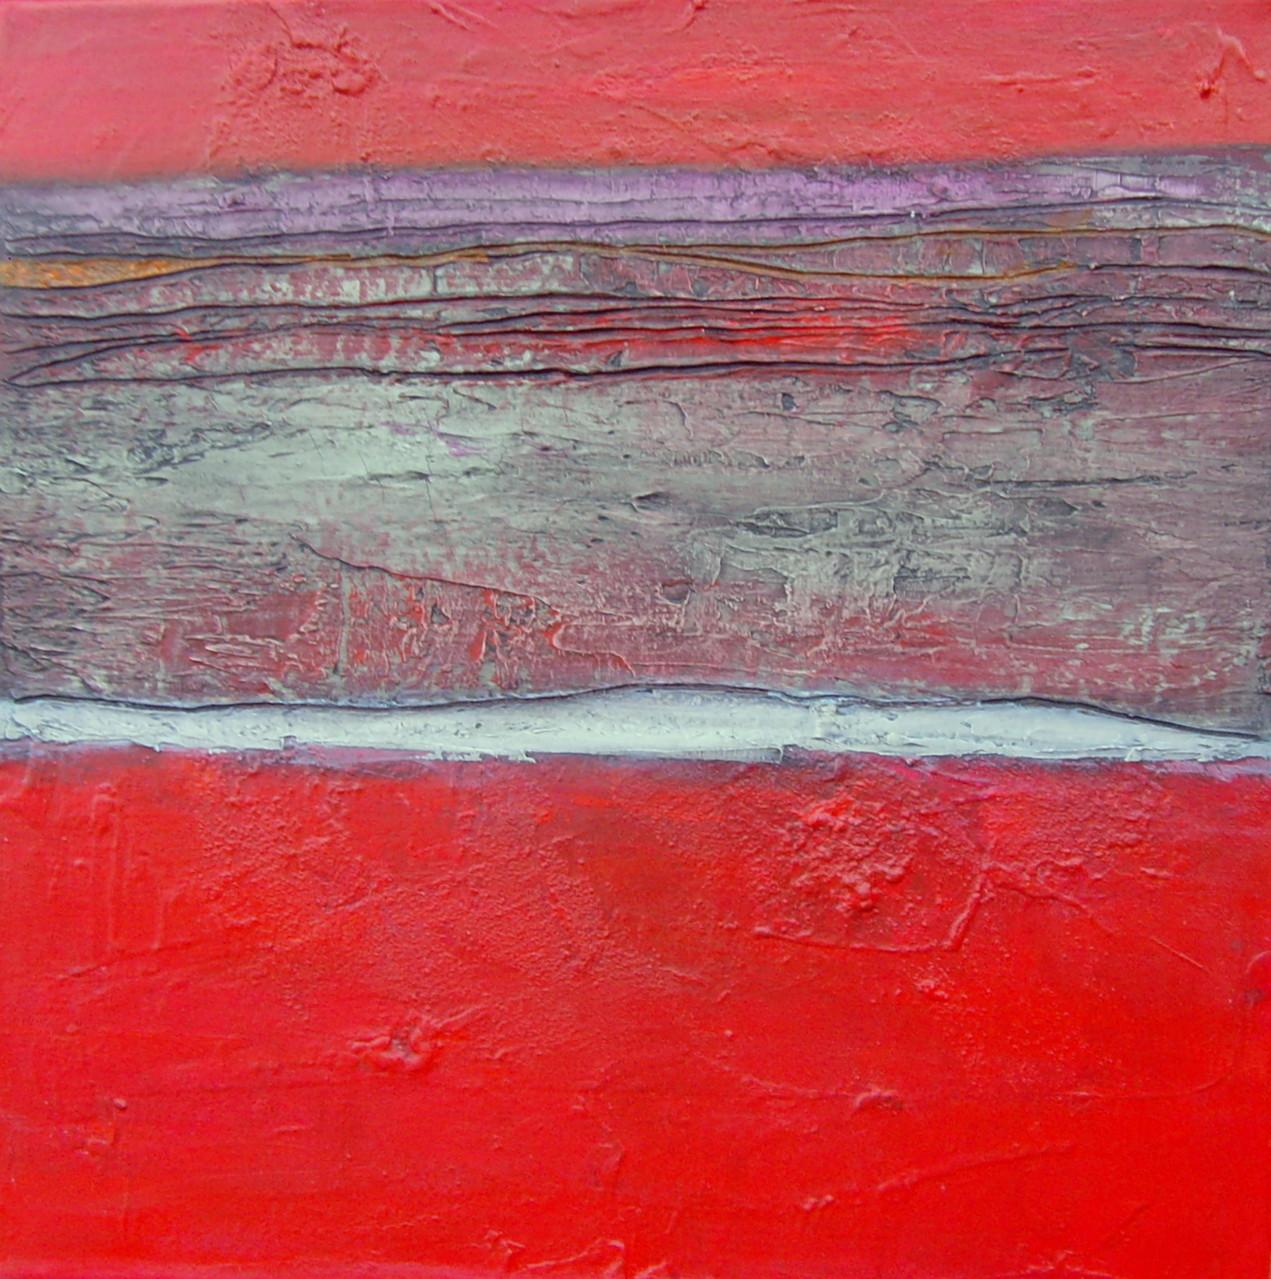 Qudratische Rot, 40cm x 40cm. Mixed Media